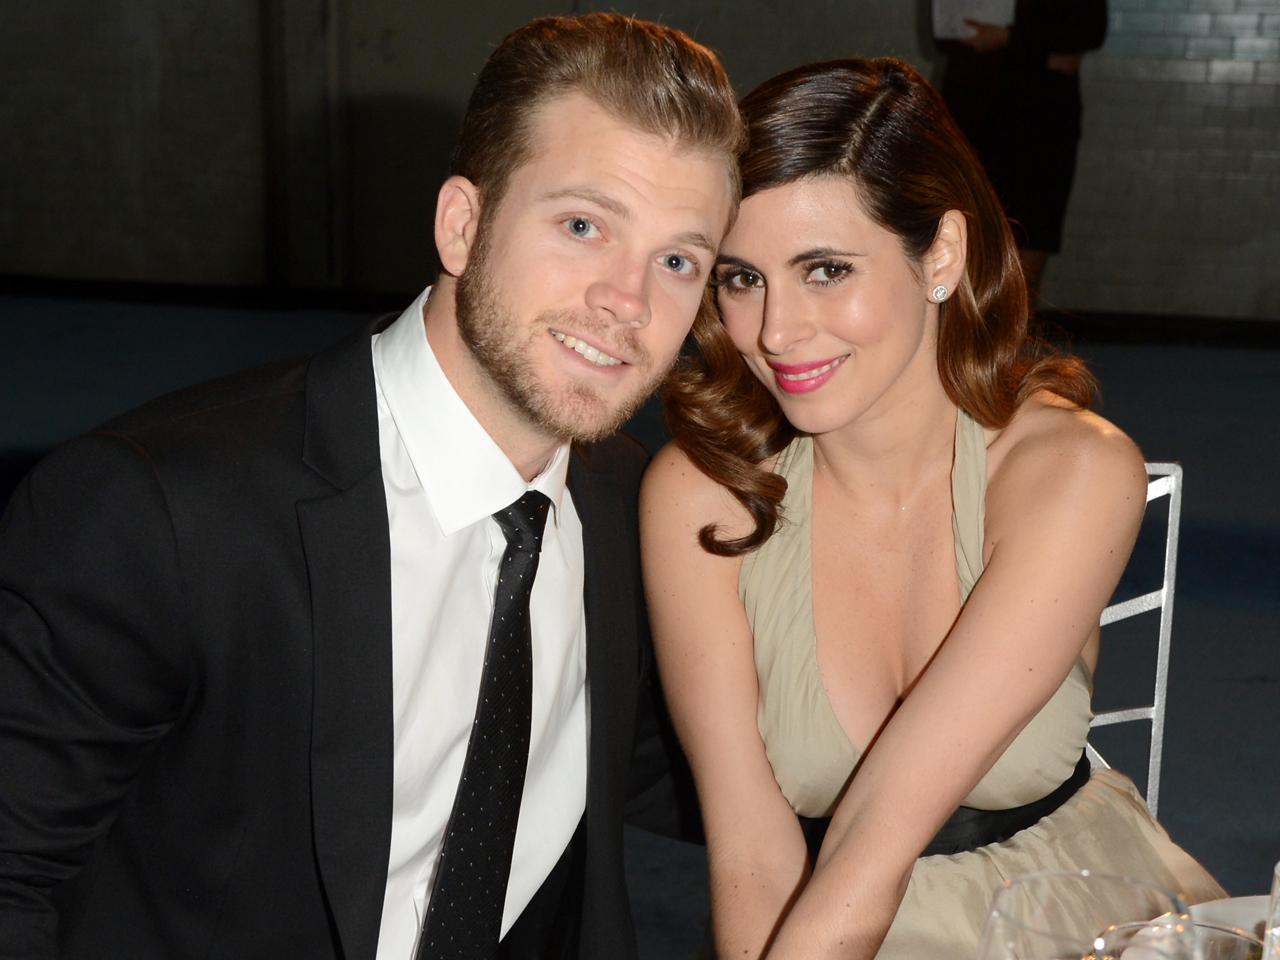 Jamie-Lynn Sigler and Cutter Dykstra expecting first child - CBS News